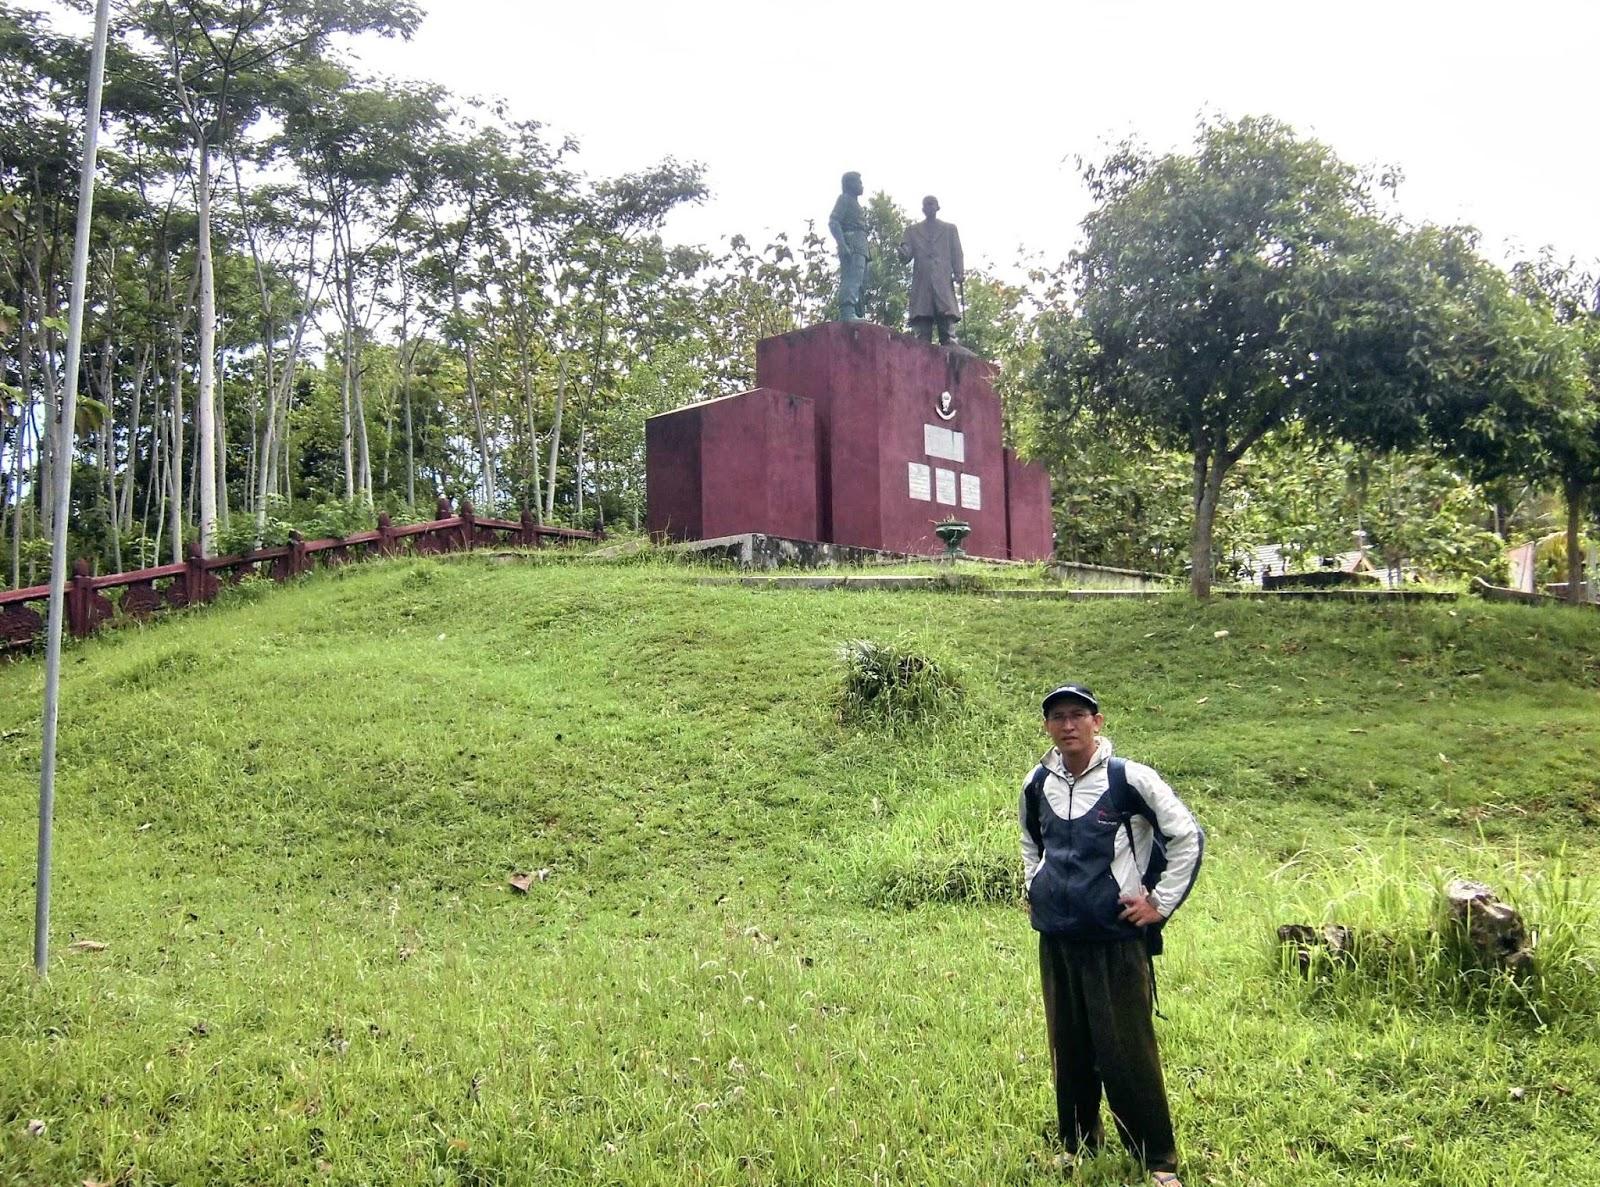 Firdaus Ubaidillah Monumen Tumpak Rinjing Pacitan Jawa Timur Menandai Rute